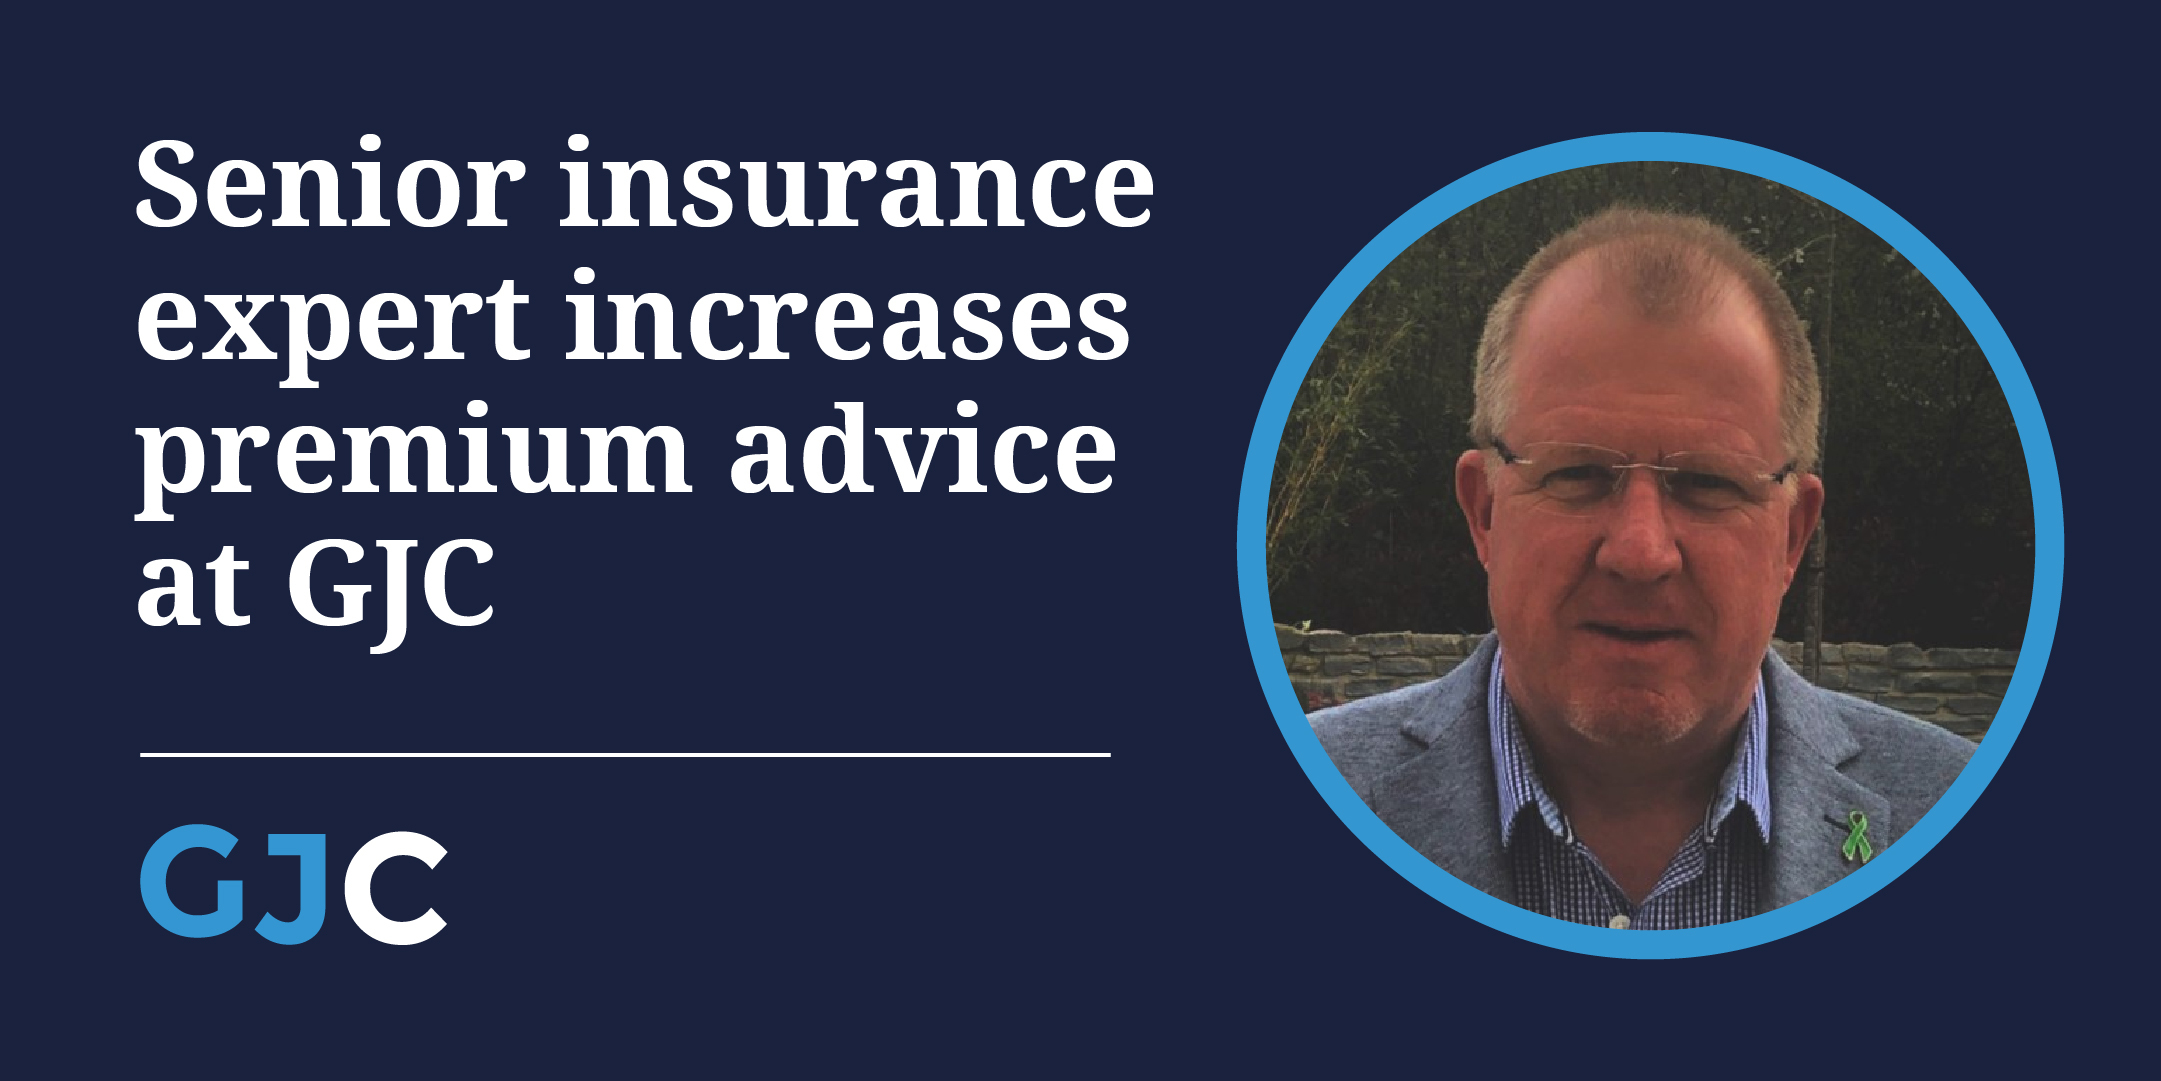 Senior insurance expert increases premium advice at GJC